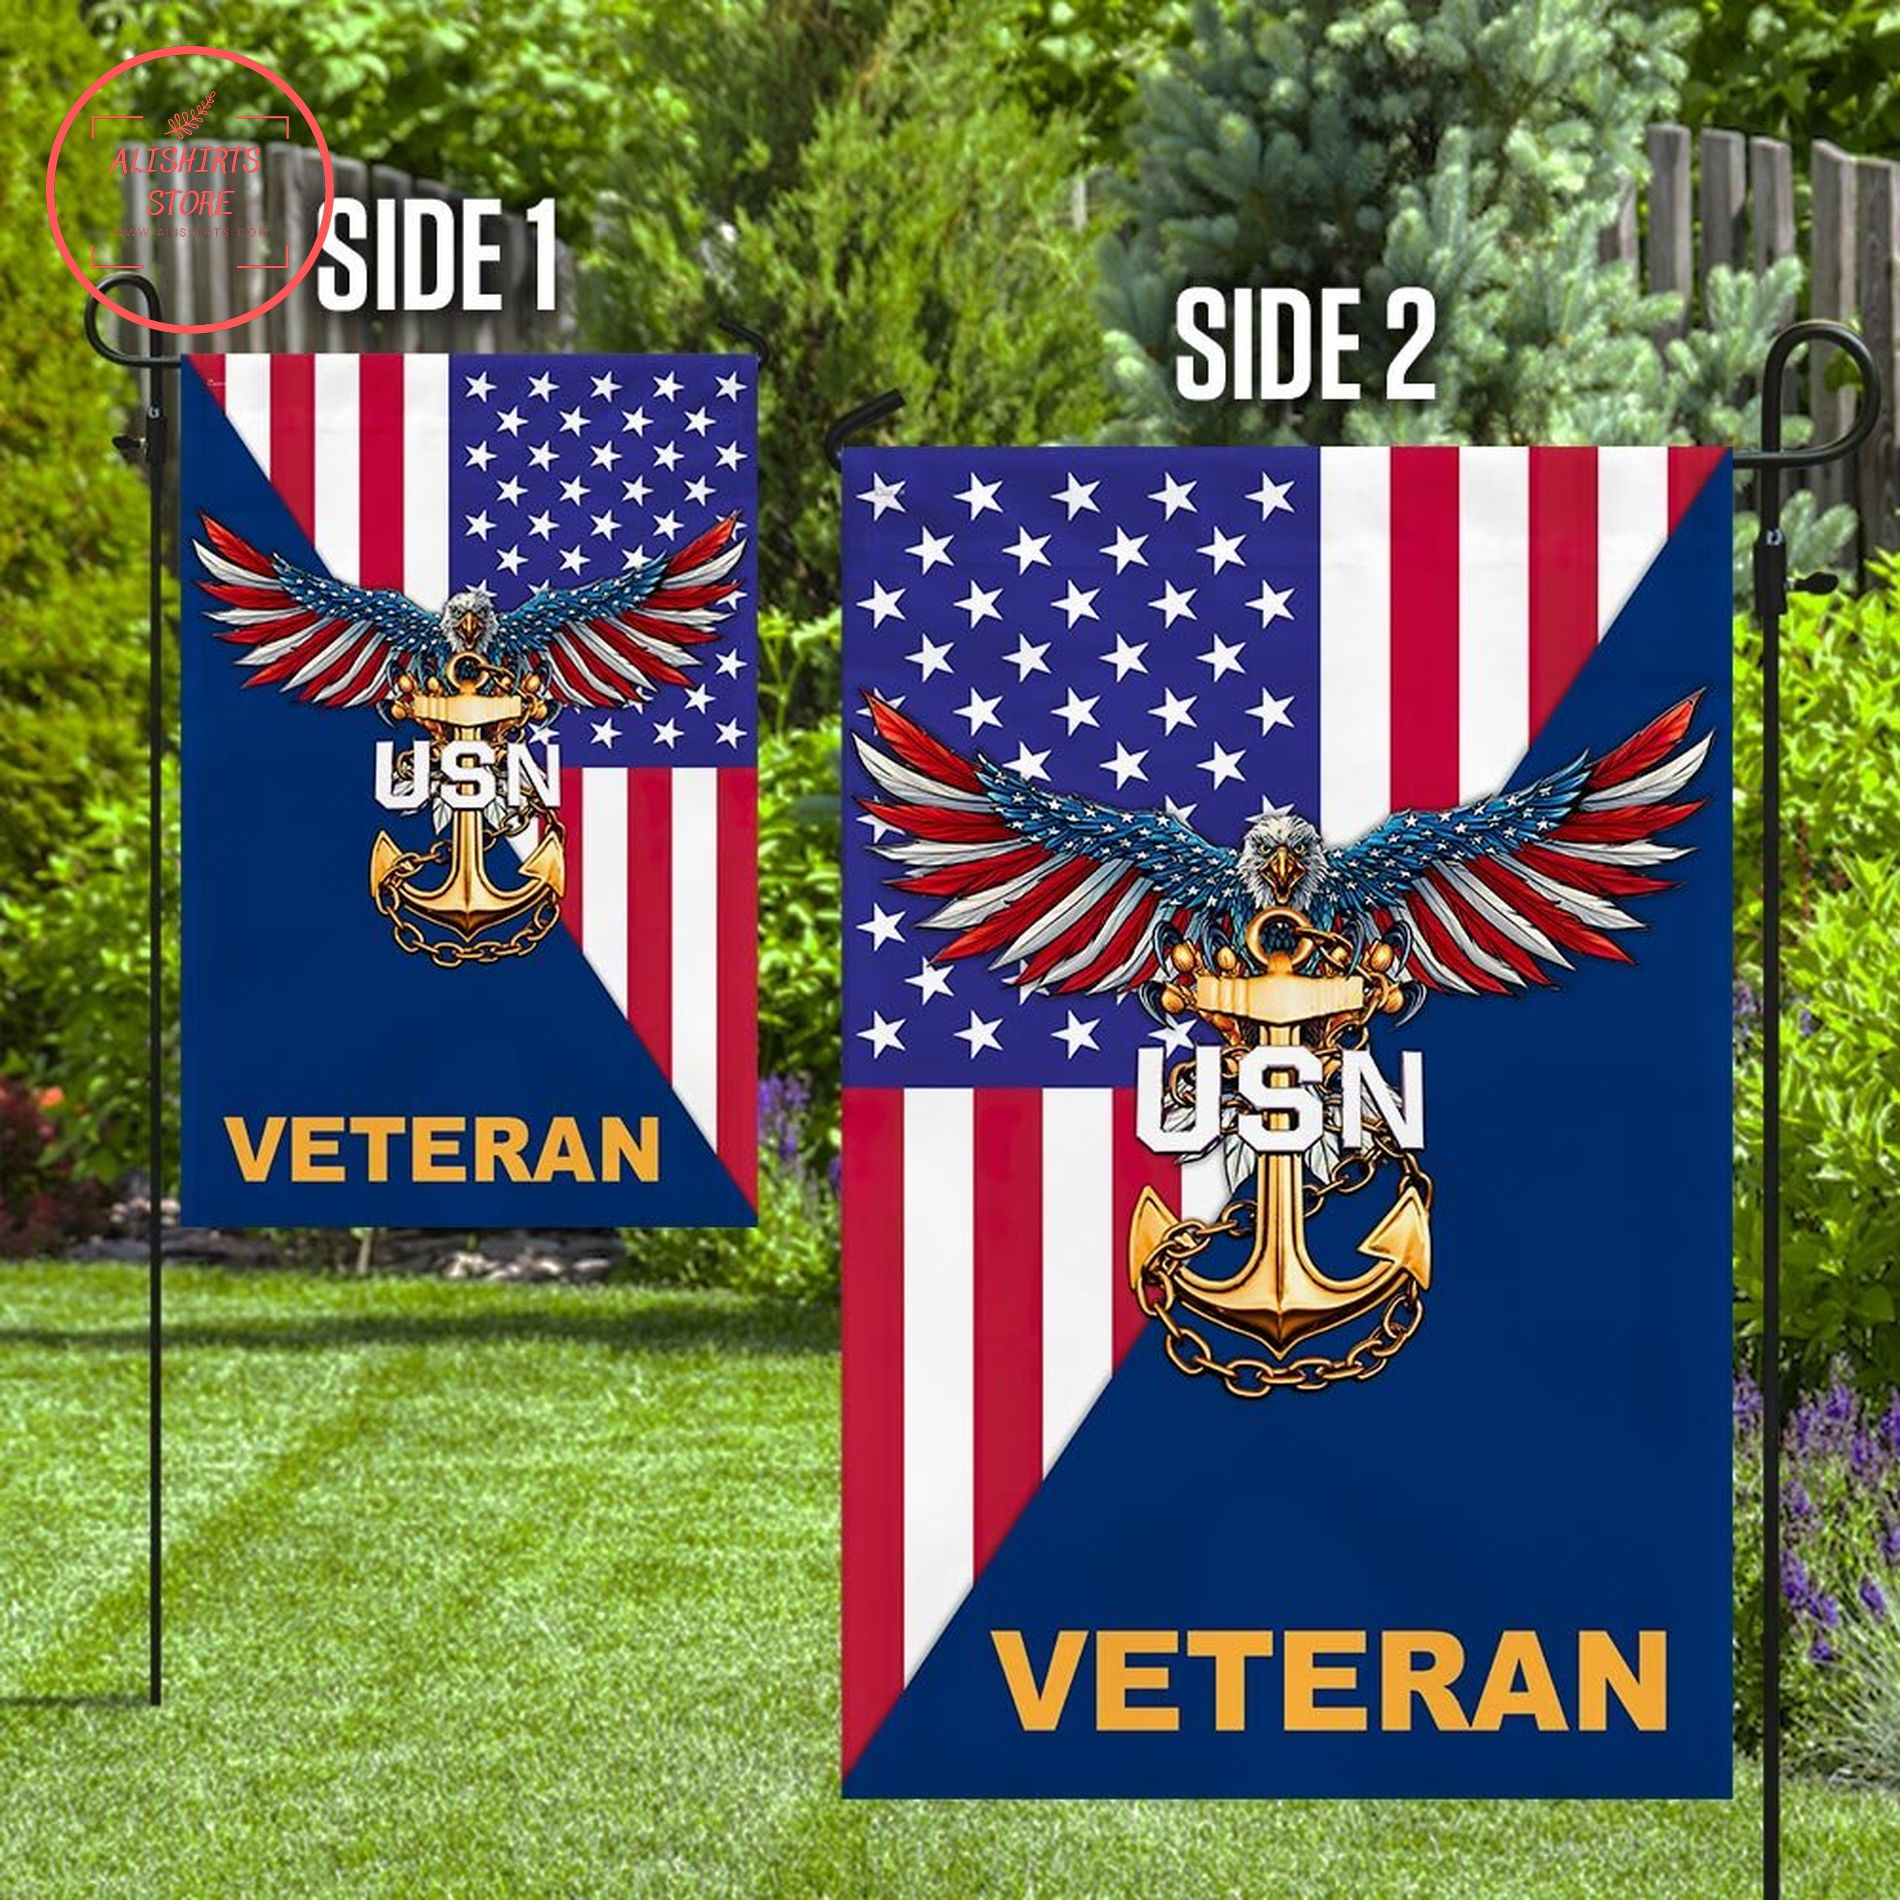 US Army veteran flag